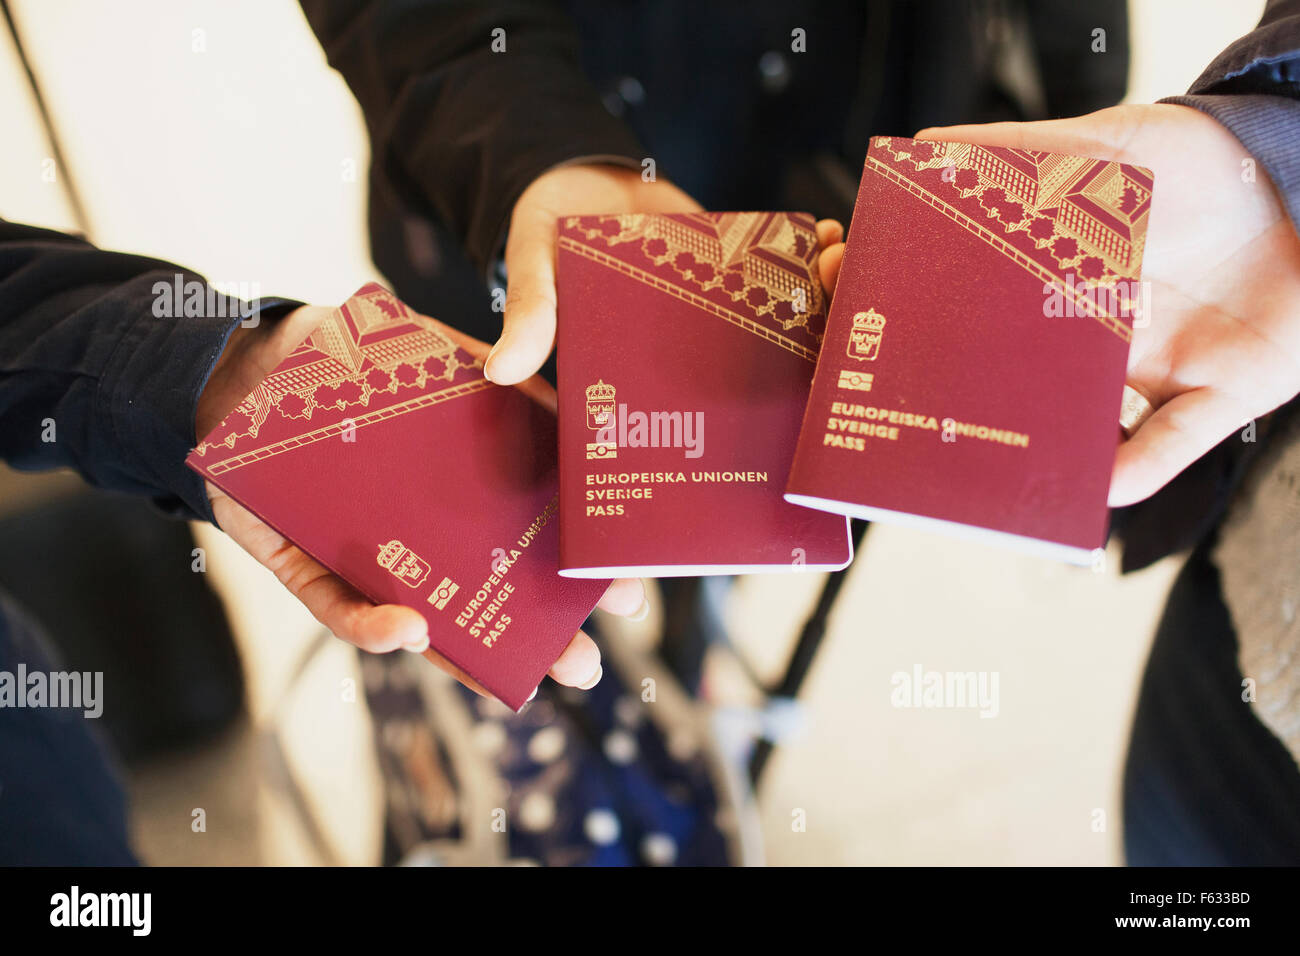 Women holding passport of the European Union - Stock Image